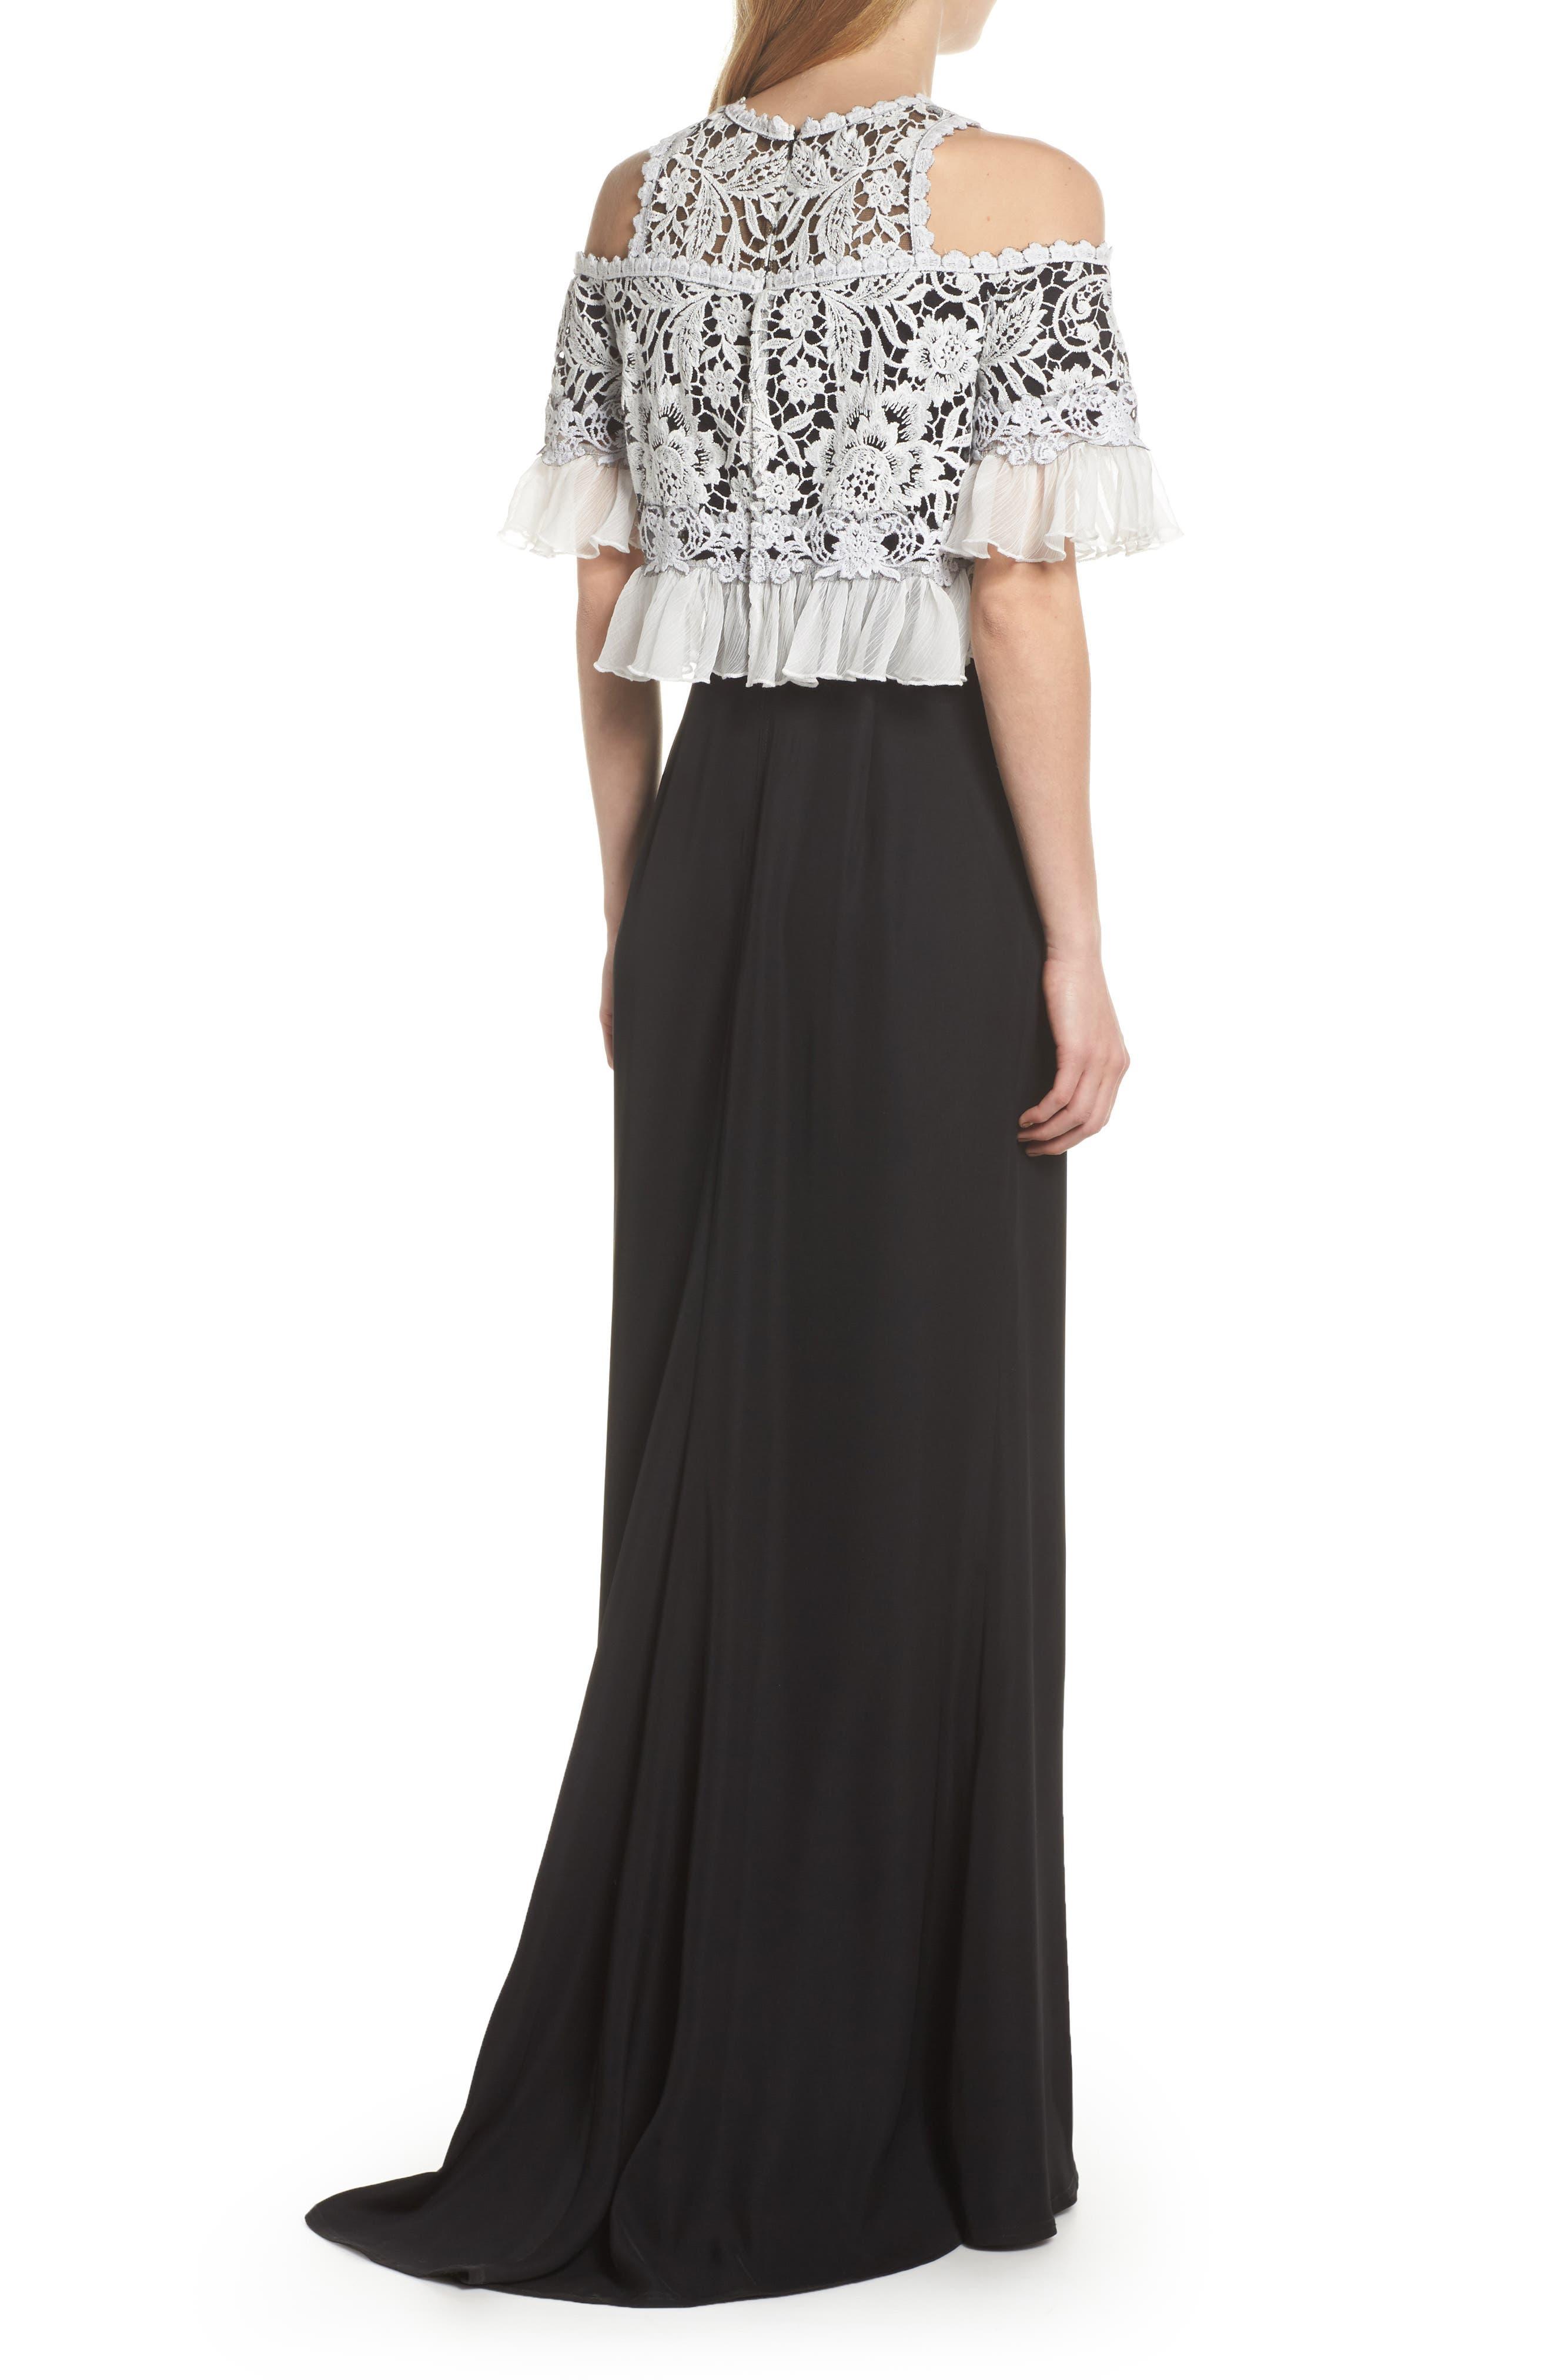 Crochet Bodice Gown,                             Alternate thumbnail 2, color,                             Black/ Ivory